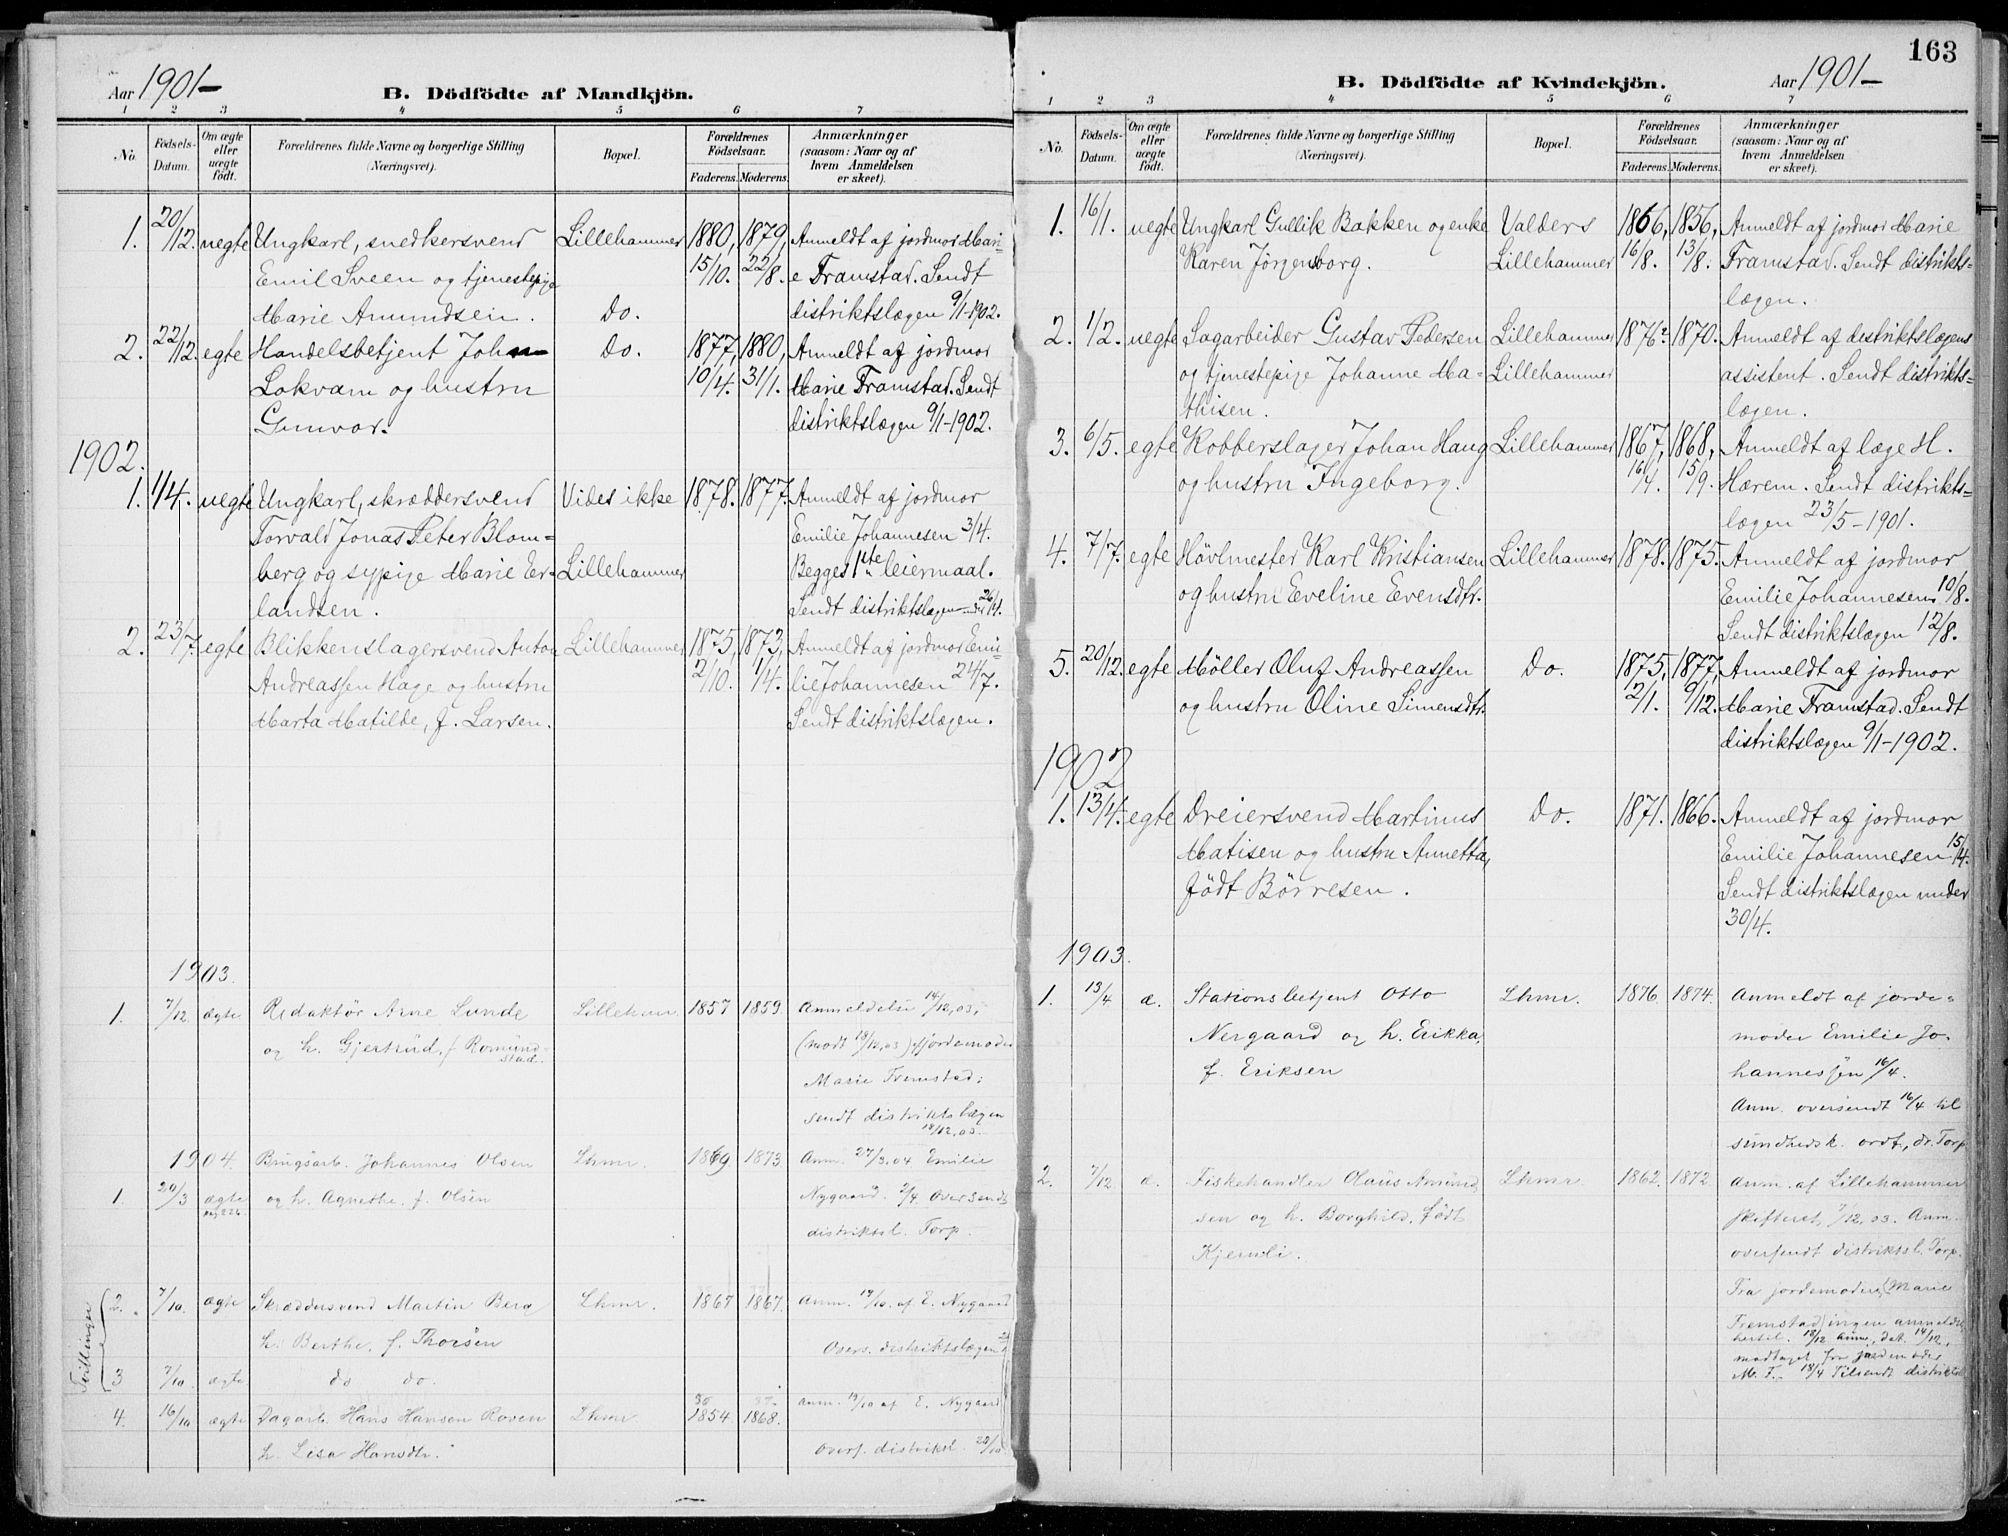 SAH, Lillehammer prestekontor, Ministerialbok nr. 1, 1901-1916, s. 163